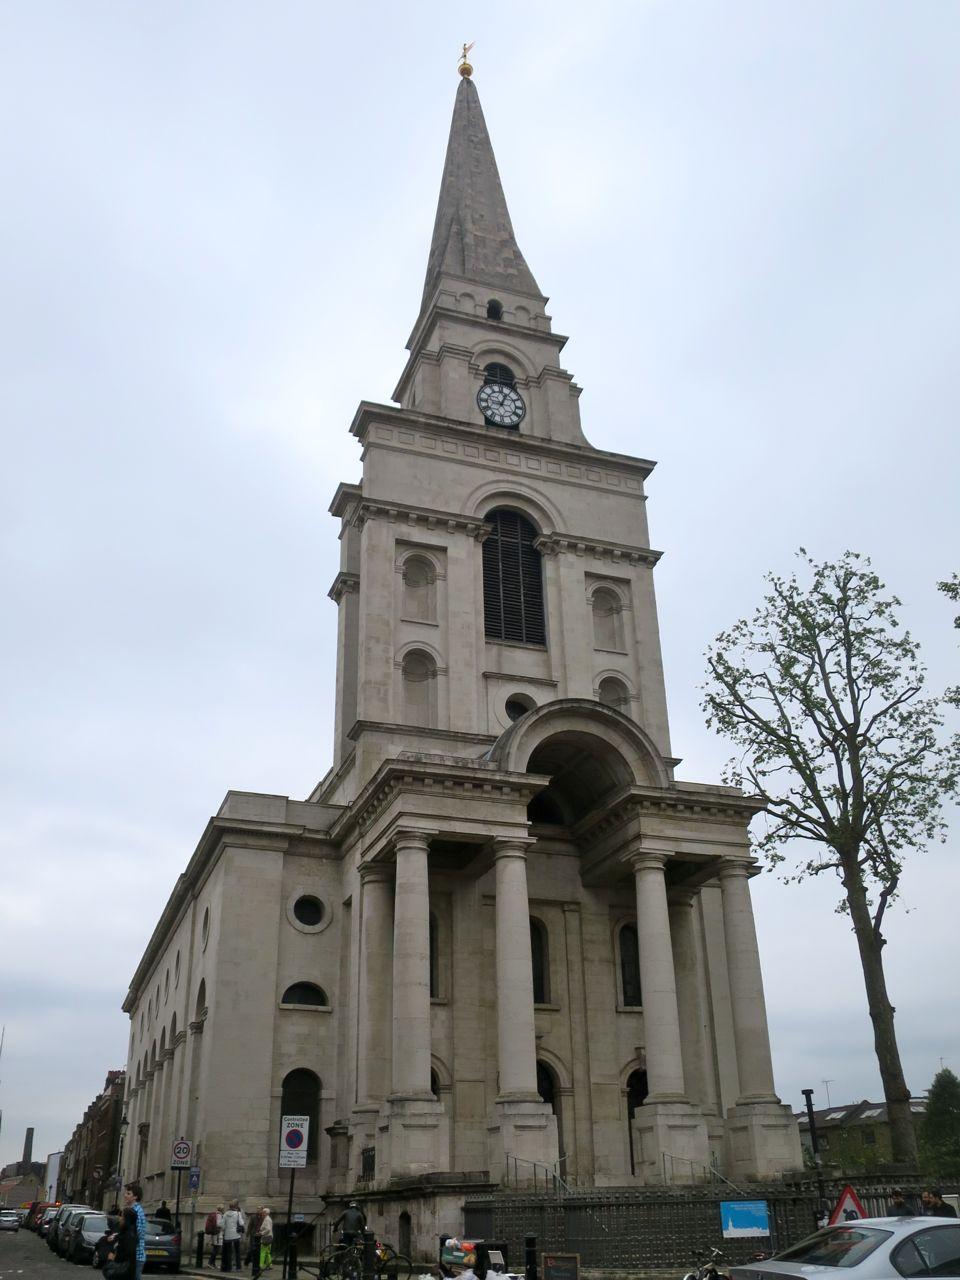 Nicholas Hawksmoor's Christ Church Spitalfields.